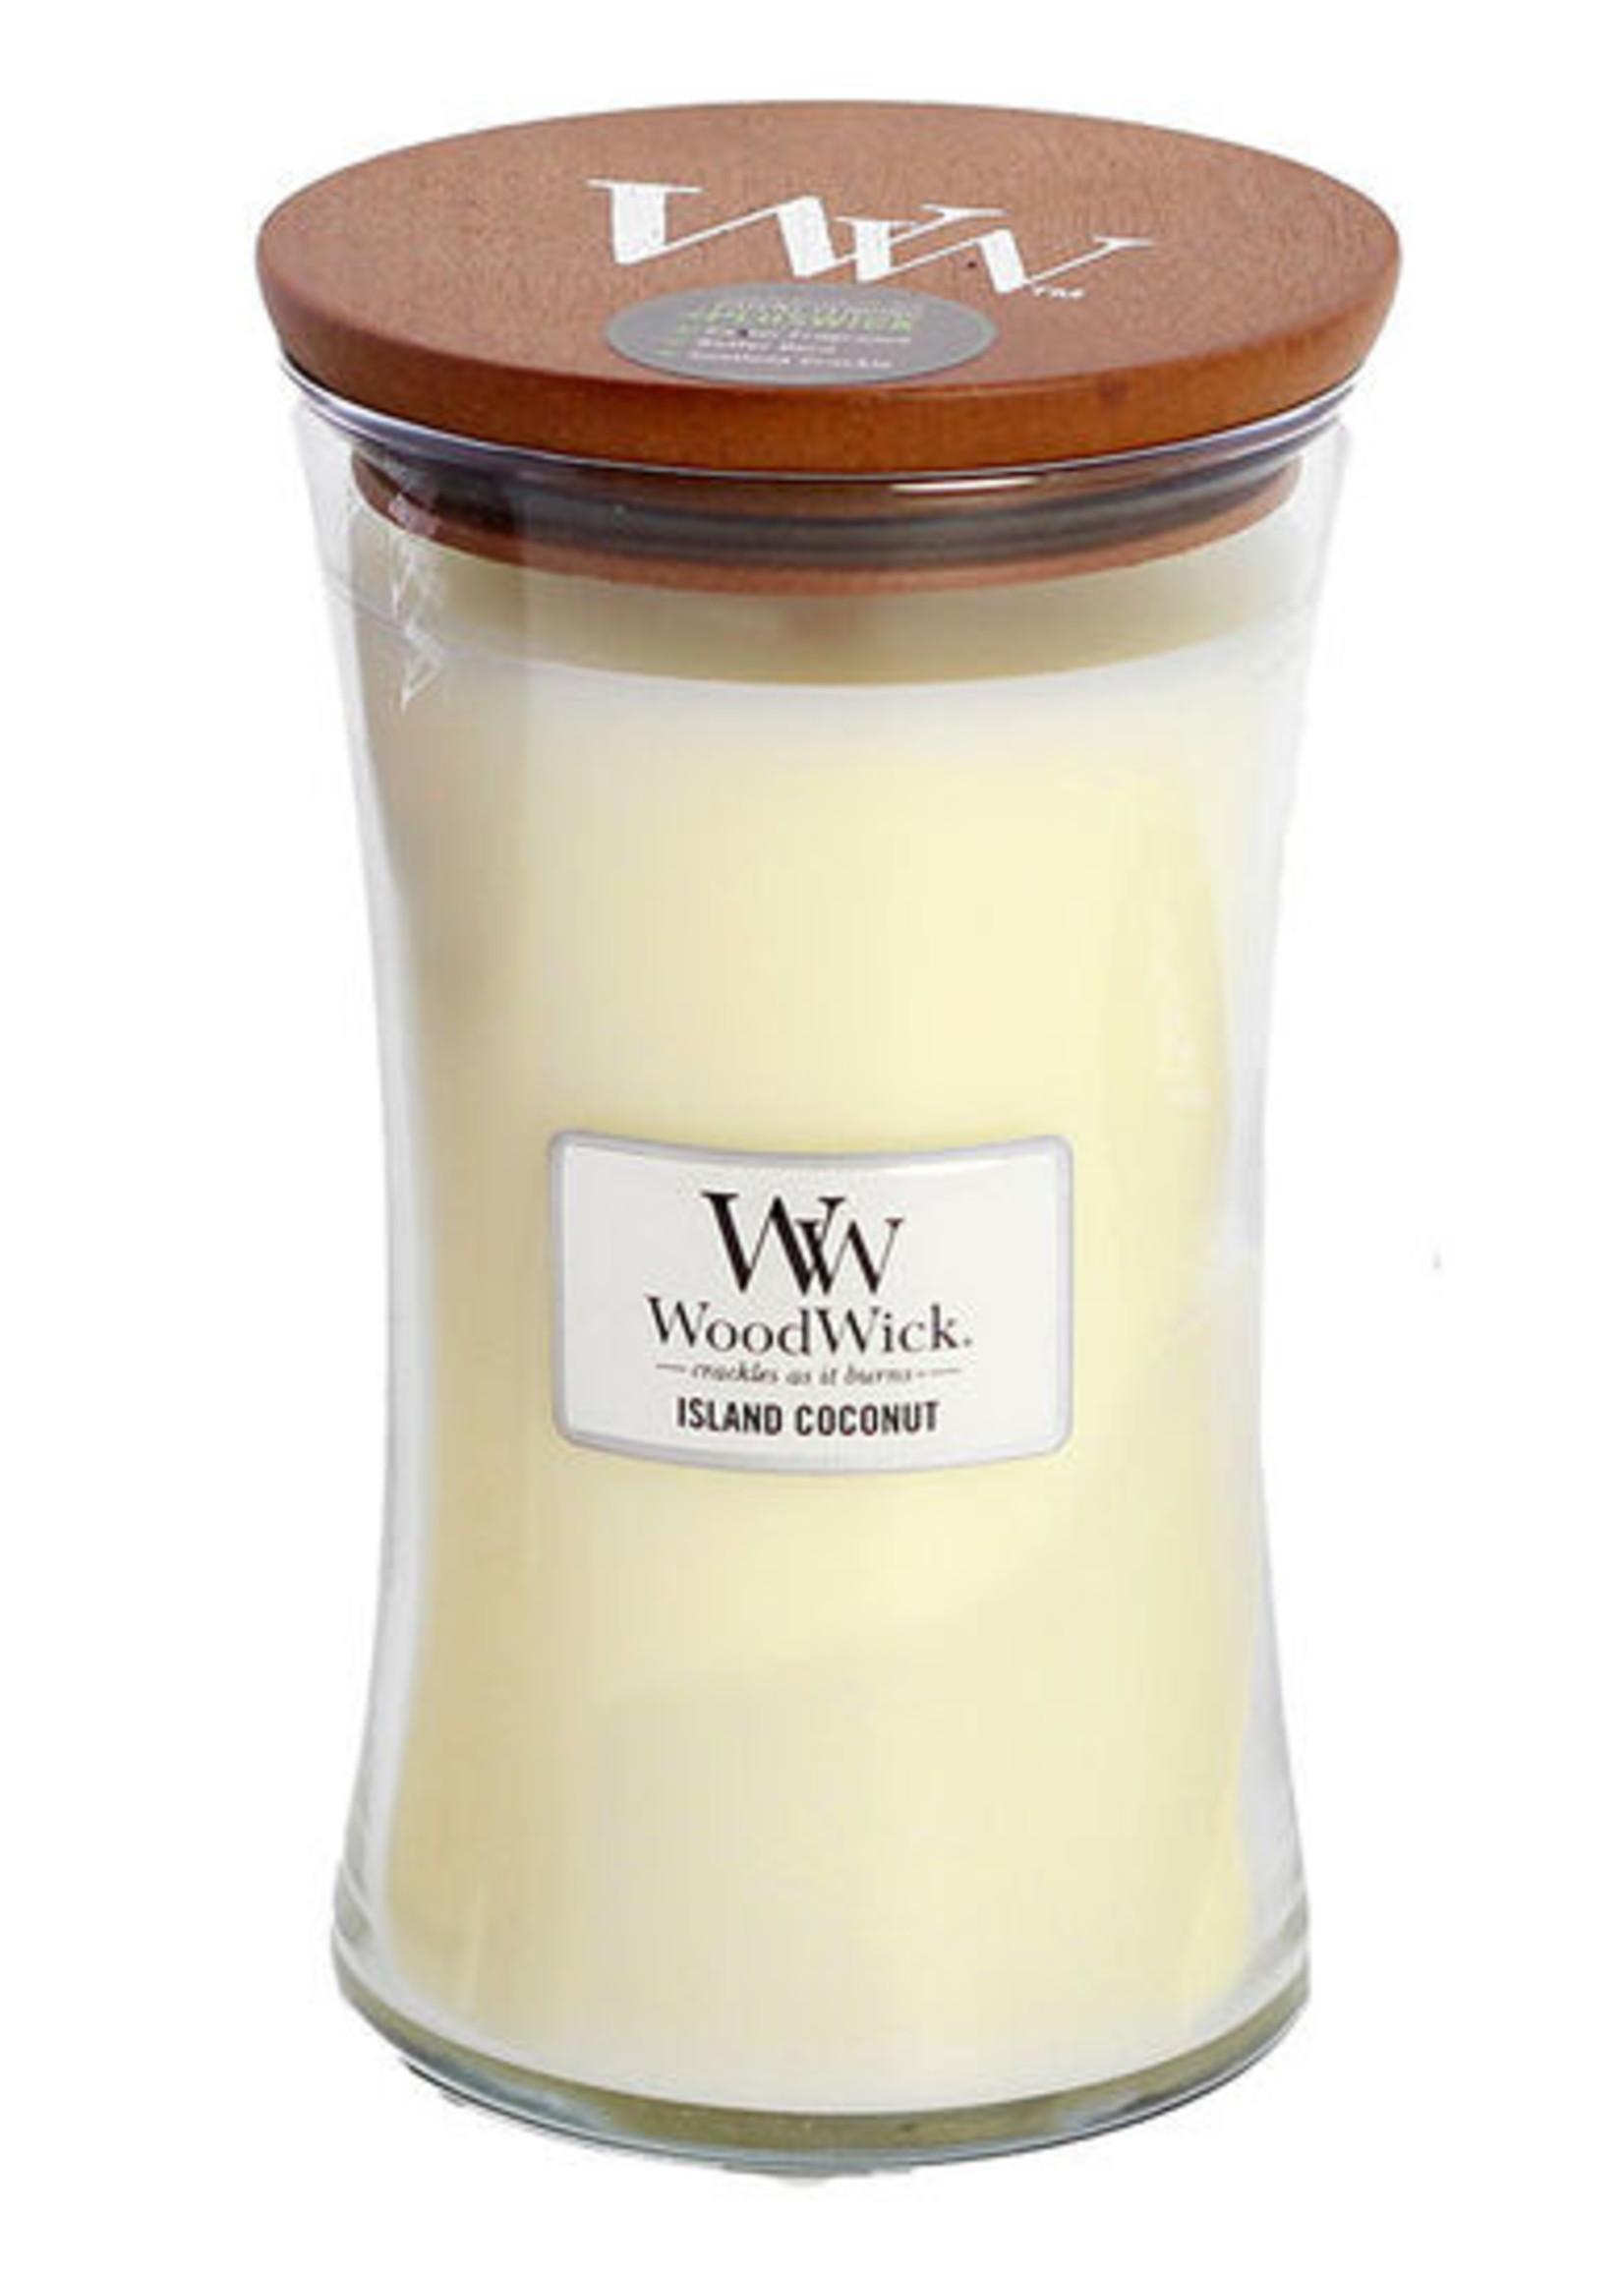 Woodwick Woodwick Island Coconut Large Candle